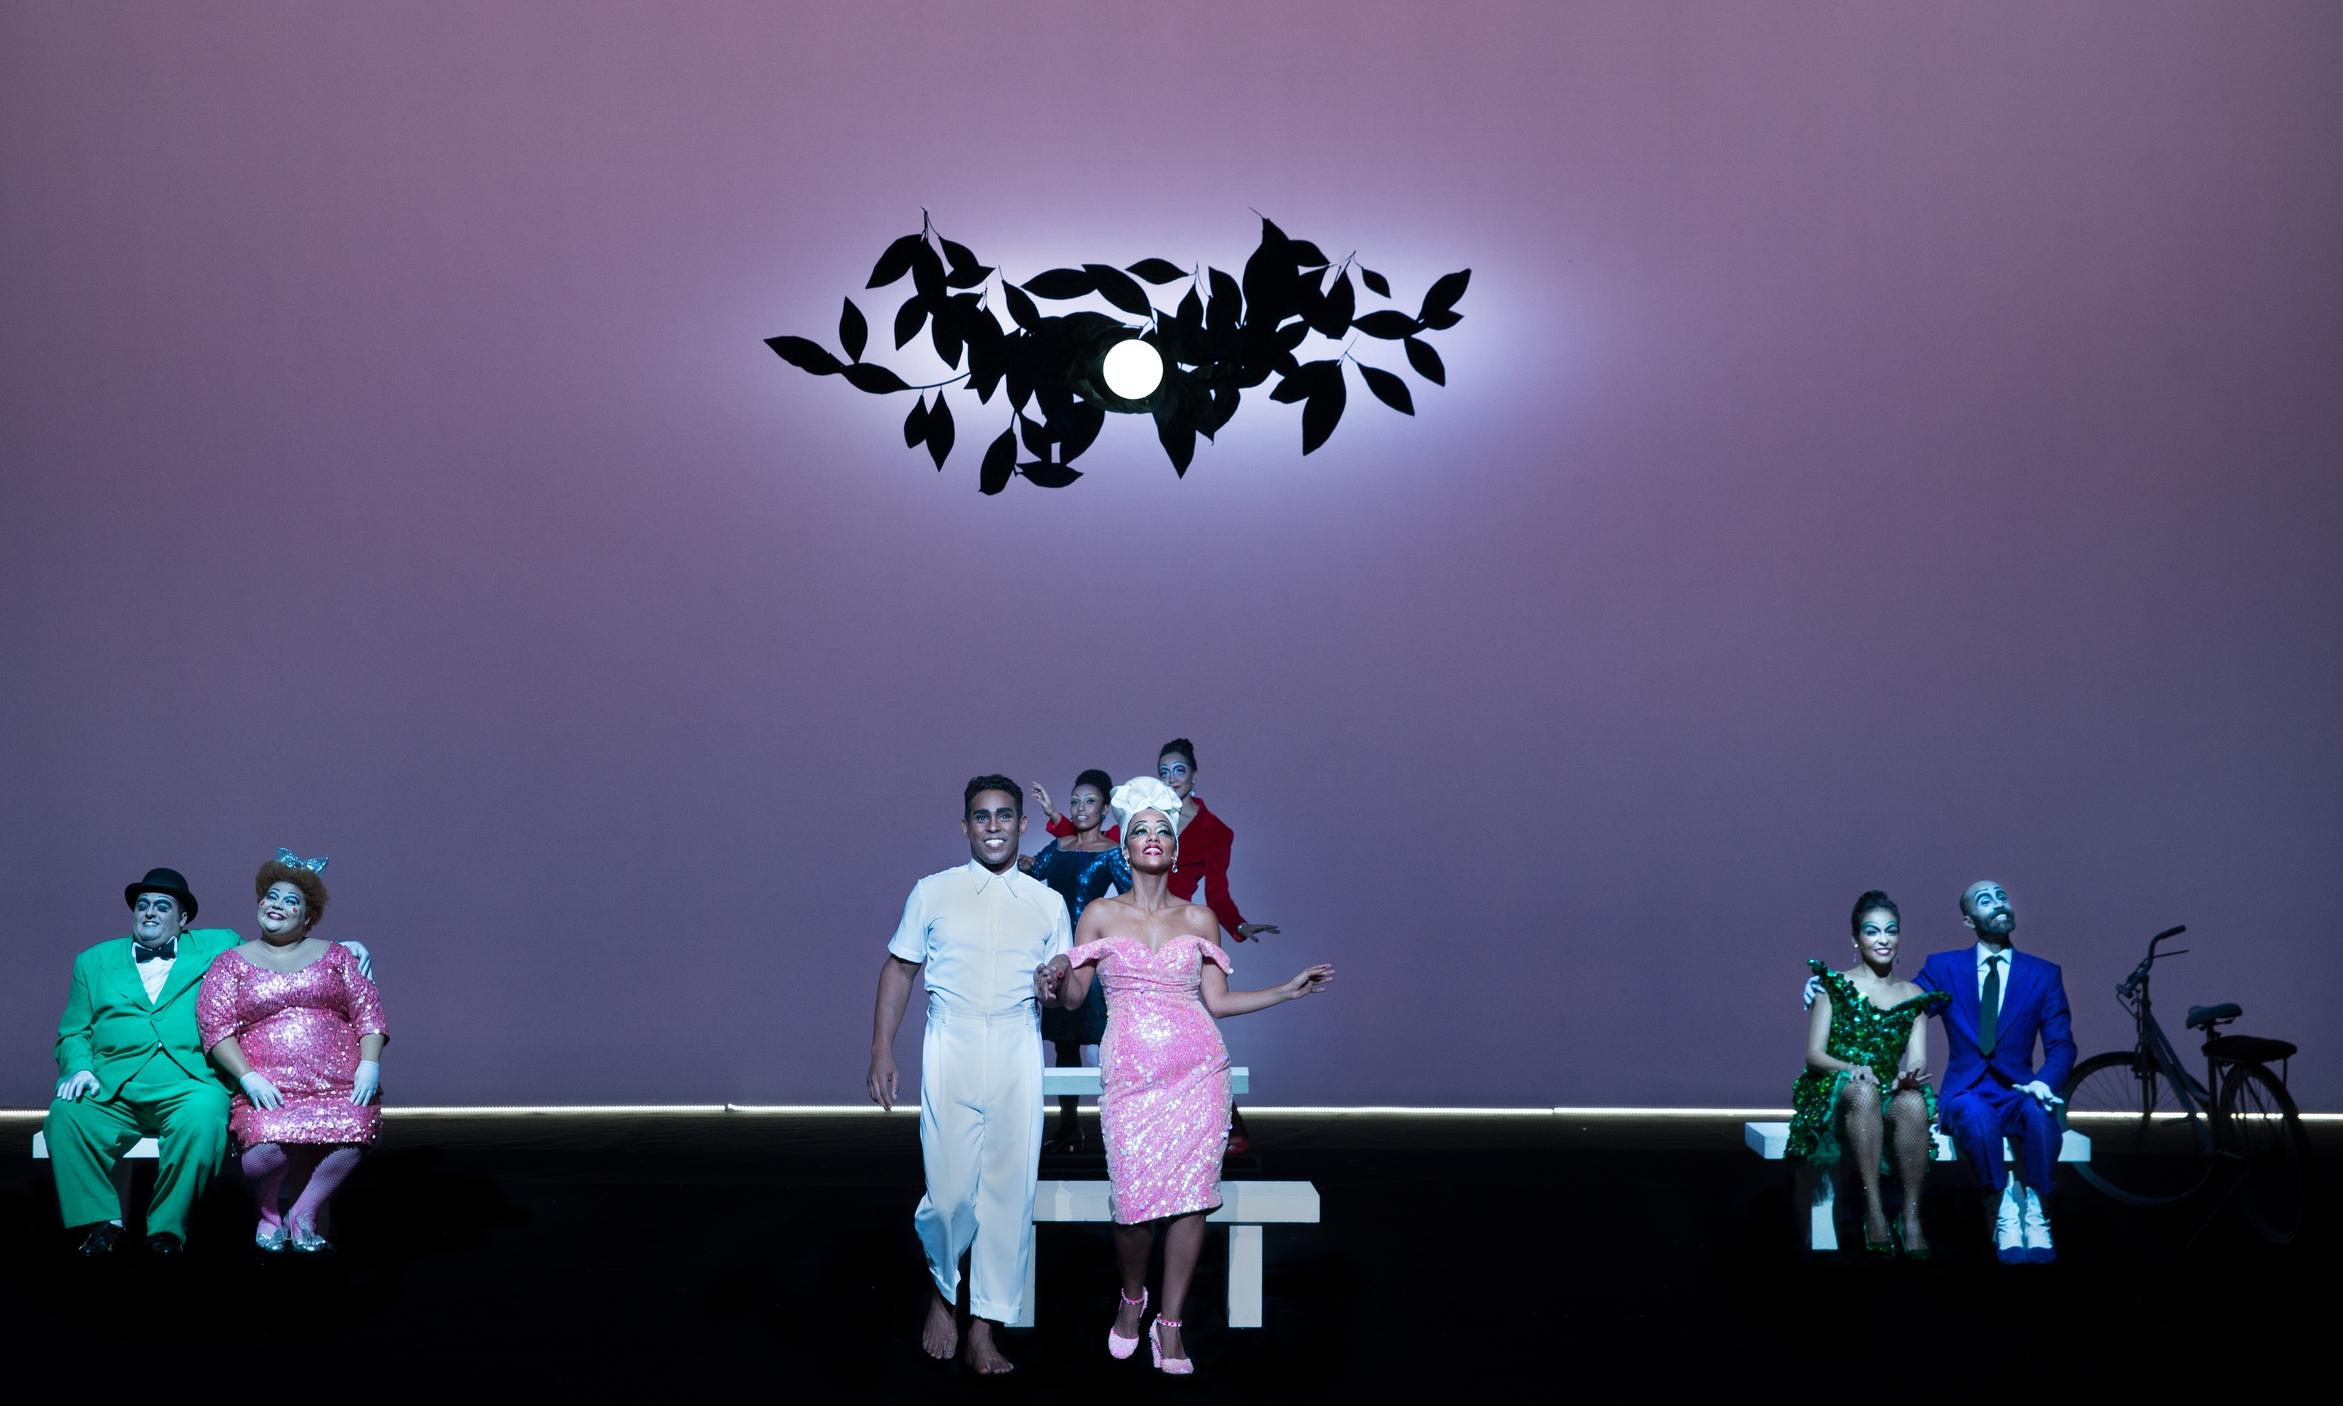 Scene IV C - Bicycles: Jhe Oliveria (Garrincha), Naruna Costa (Elza Soares), Ensemble